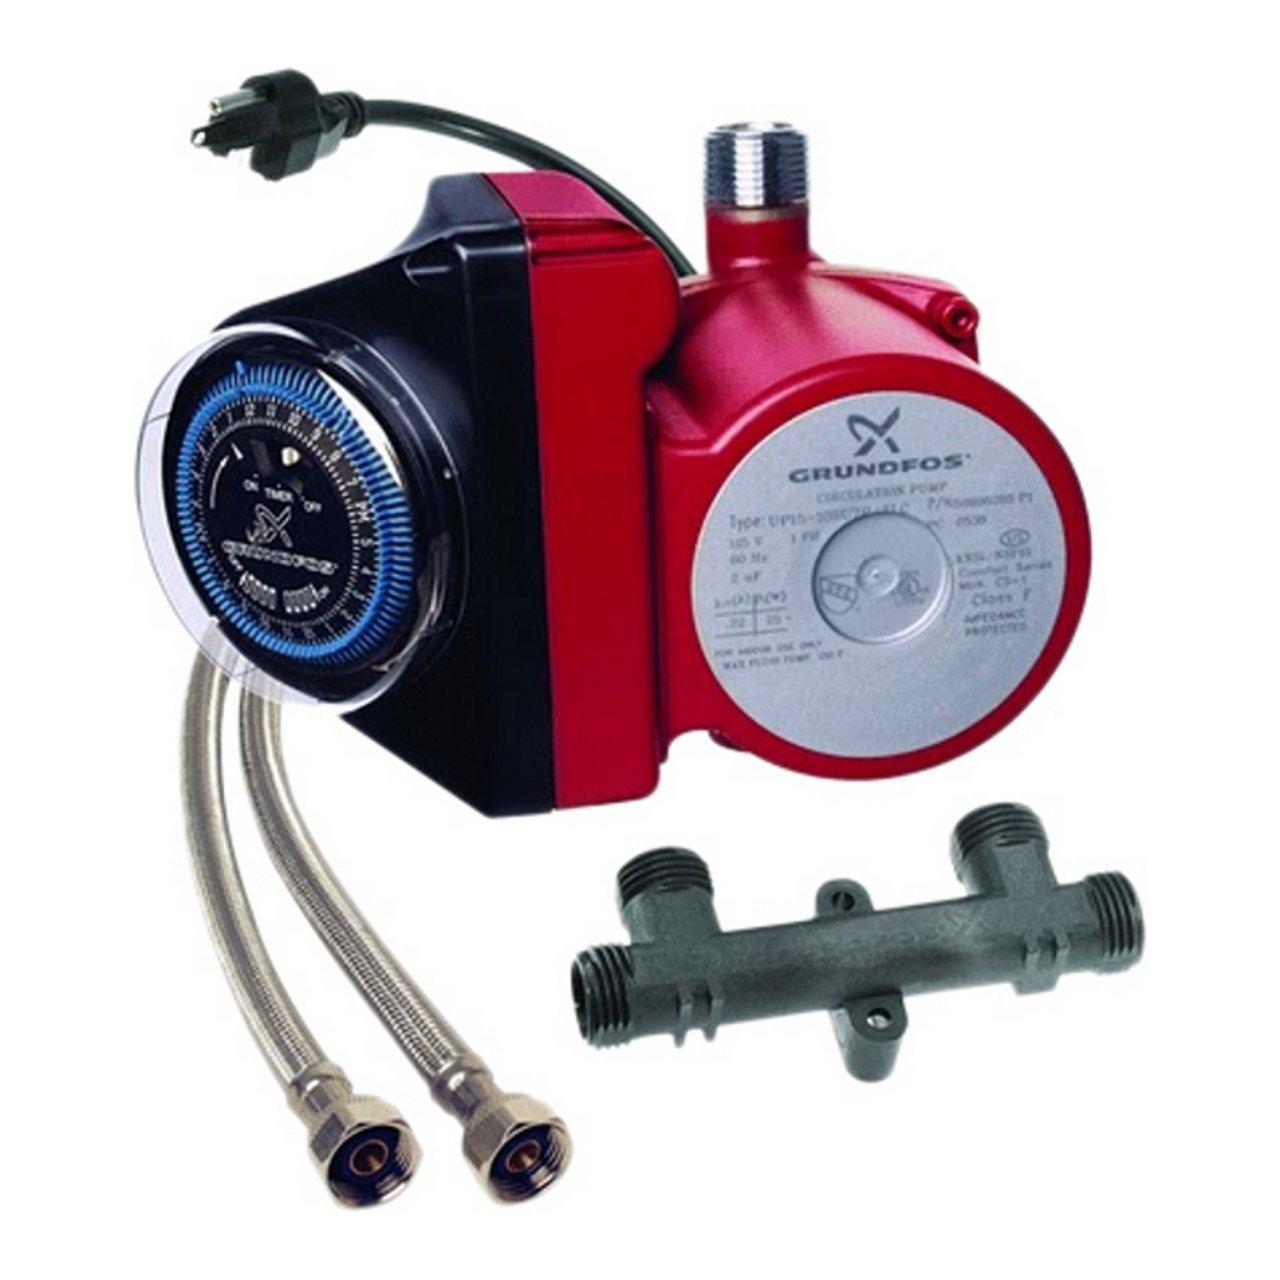 Circulation pump for heating Grundfos: selection, characteristics, installation, reviews 79